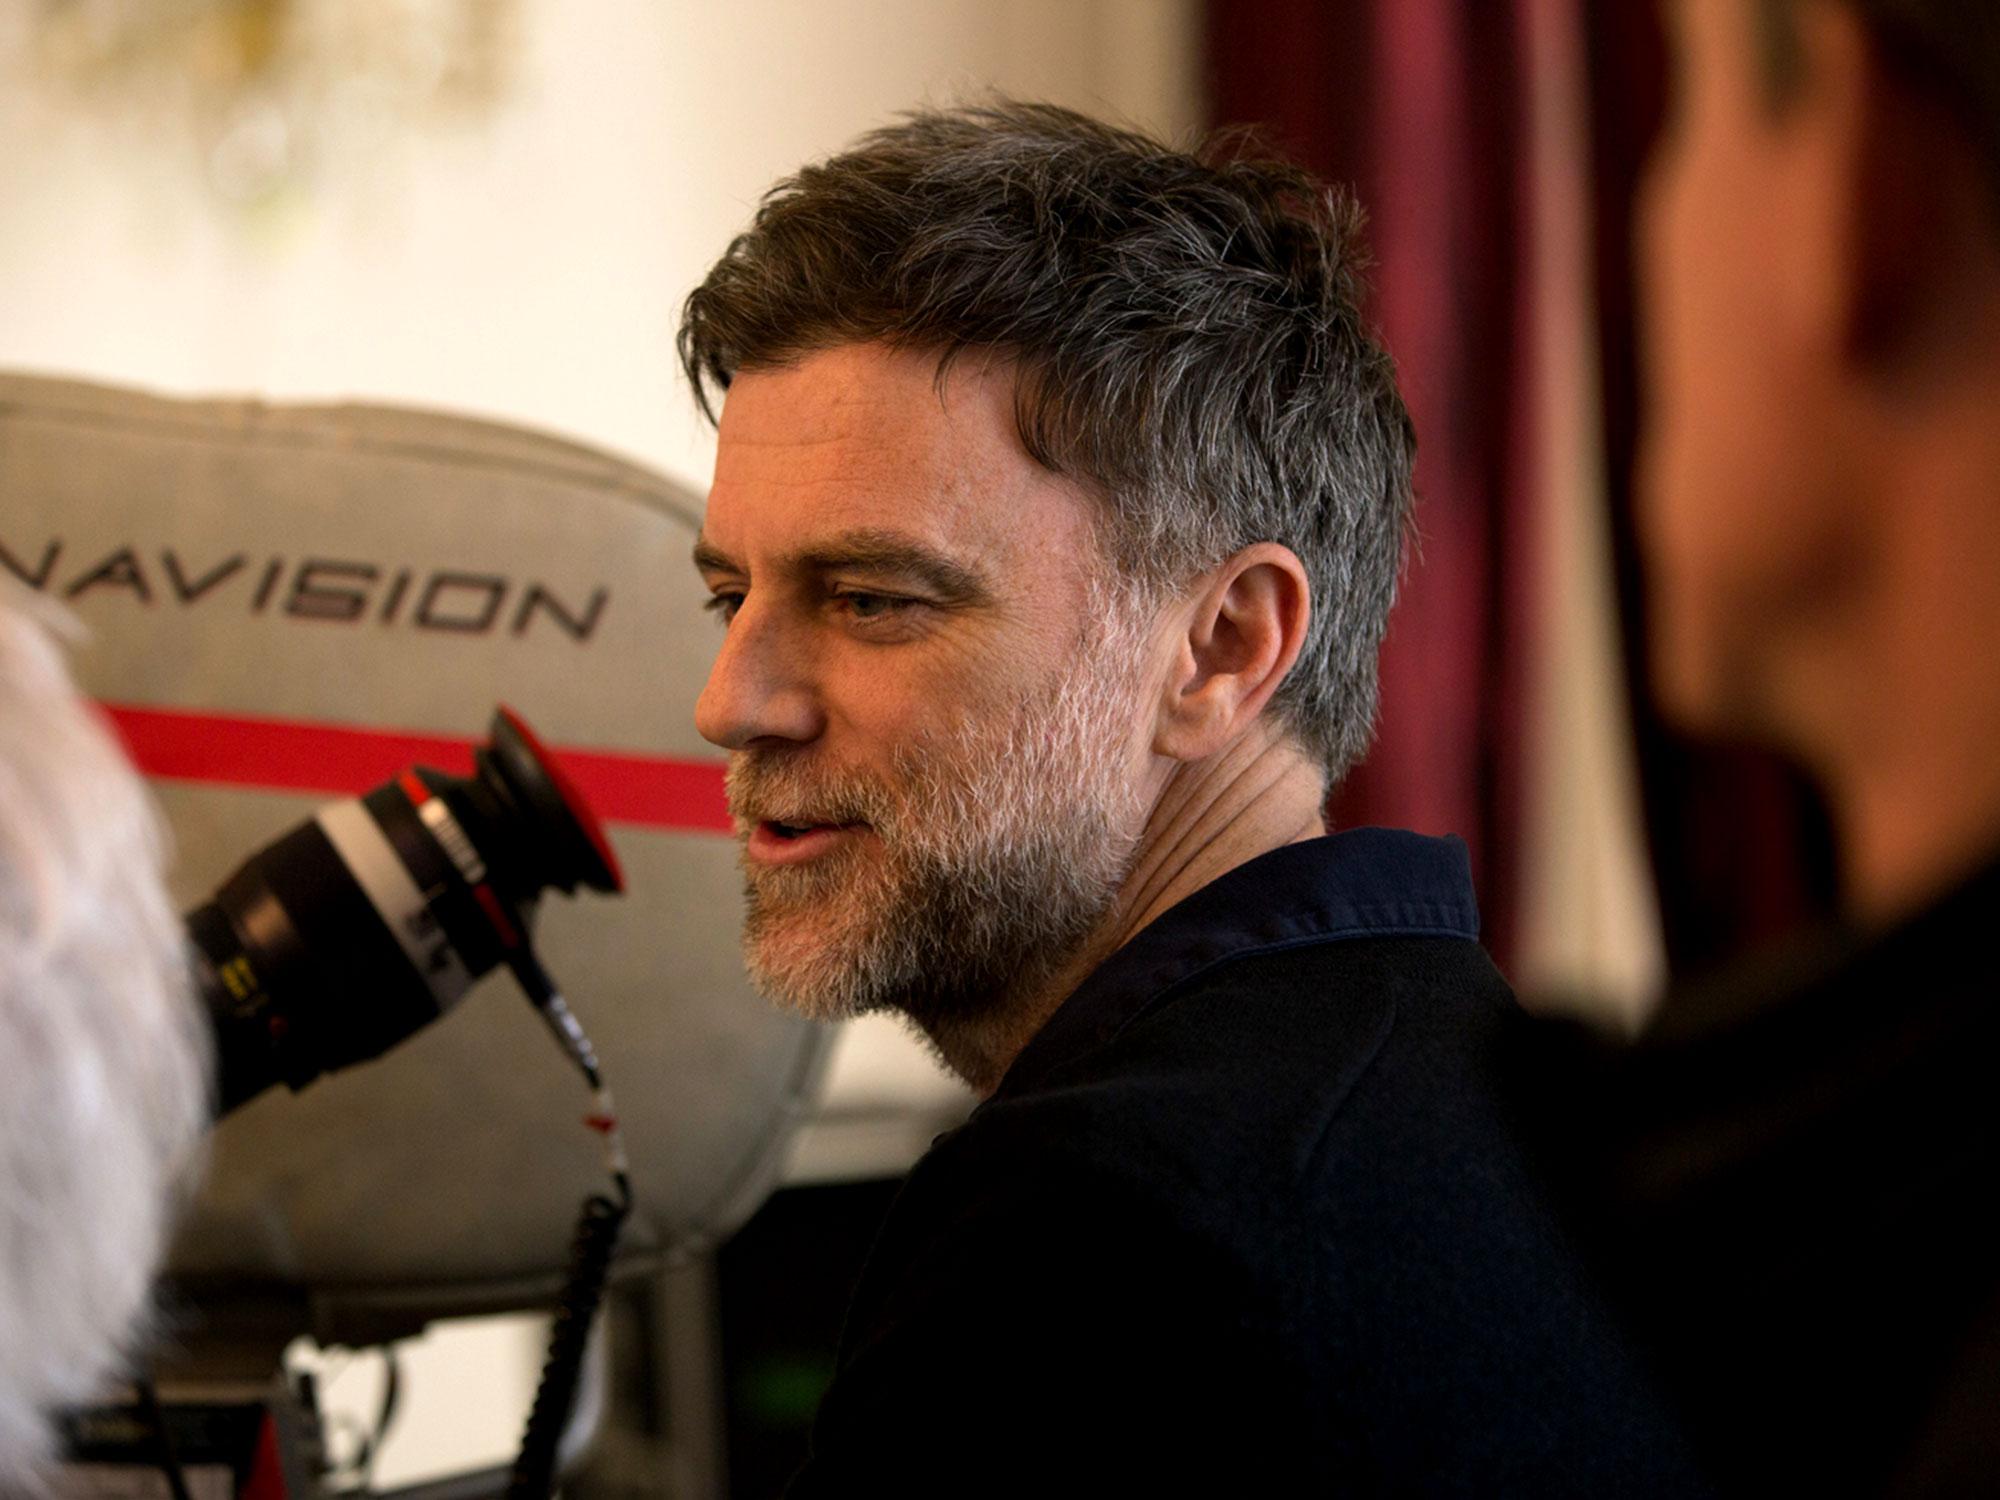 Paul Thomas Anderson on the set of Phantom Thread